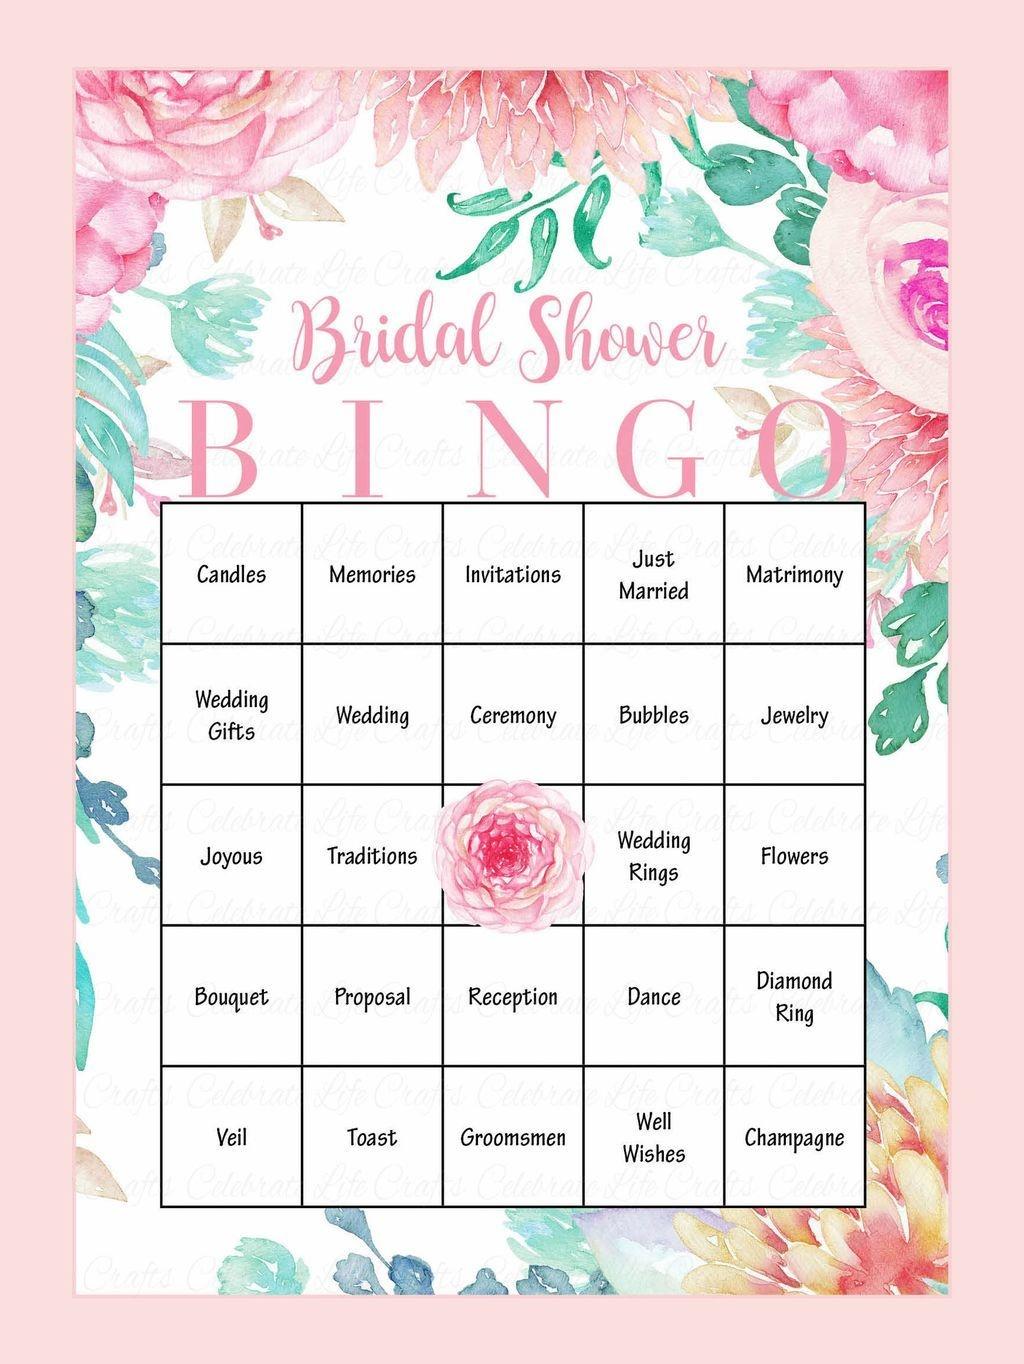 10 Printable Bridal Shower Games You Can Diy | Wedding Ideas - Free Printable Bridal Shower Blank Bingo Games